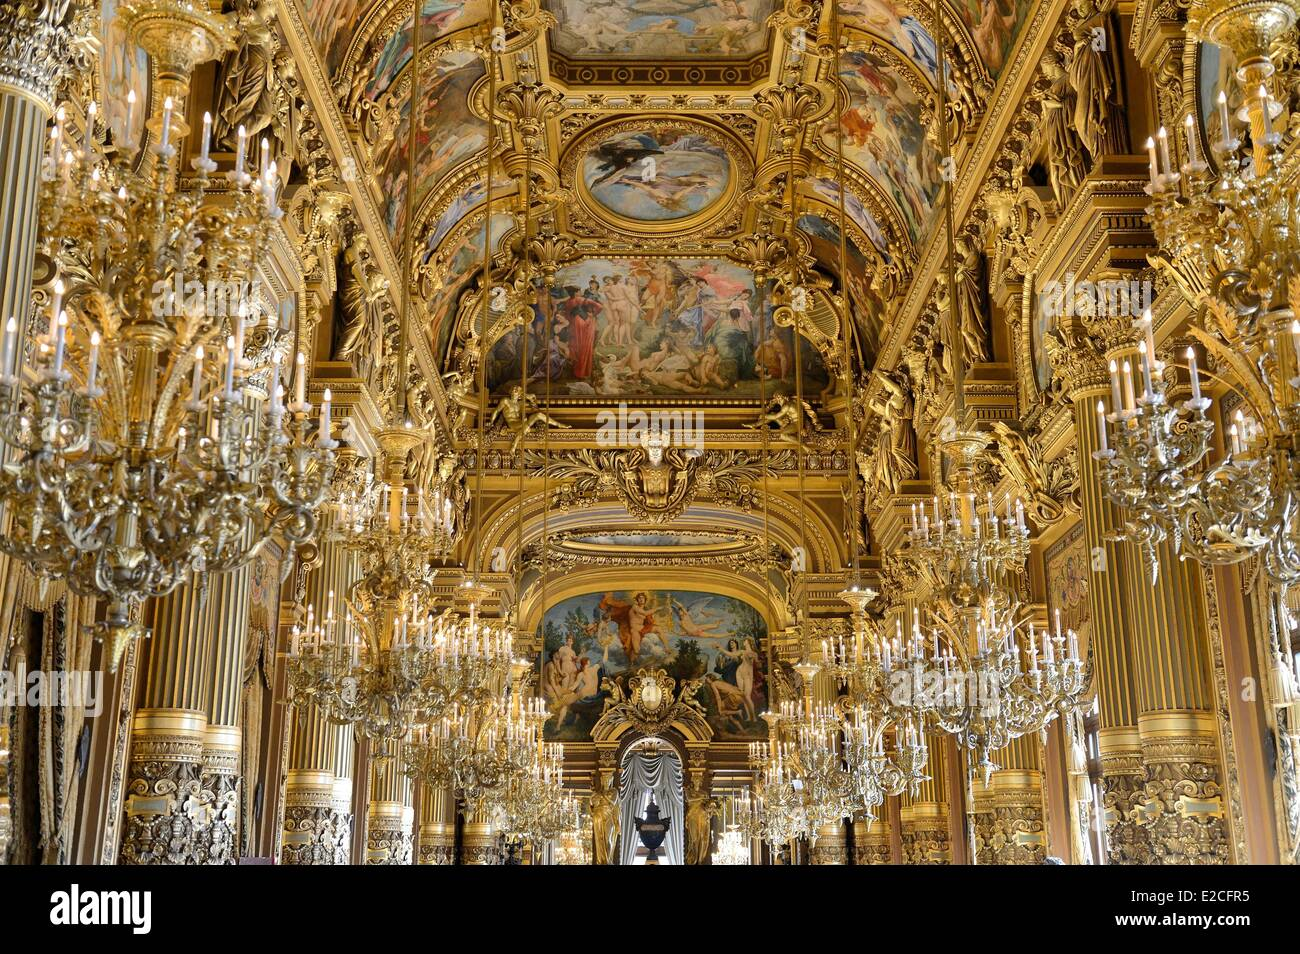 France, Paris, Garnier Opera, the Grand Foyer - Stock Image